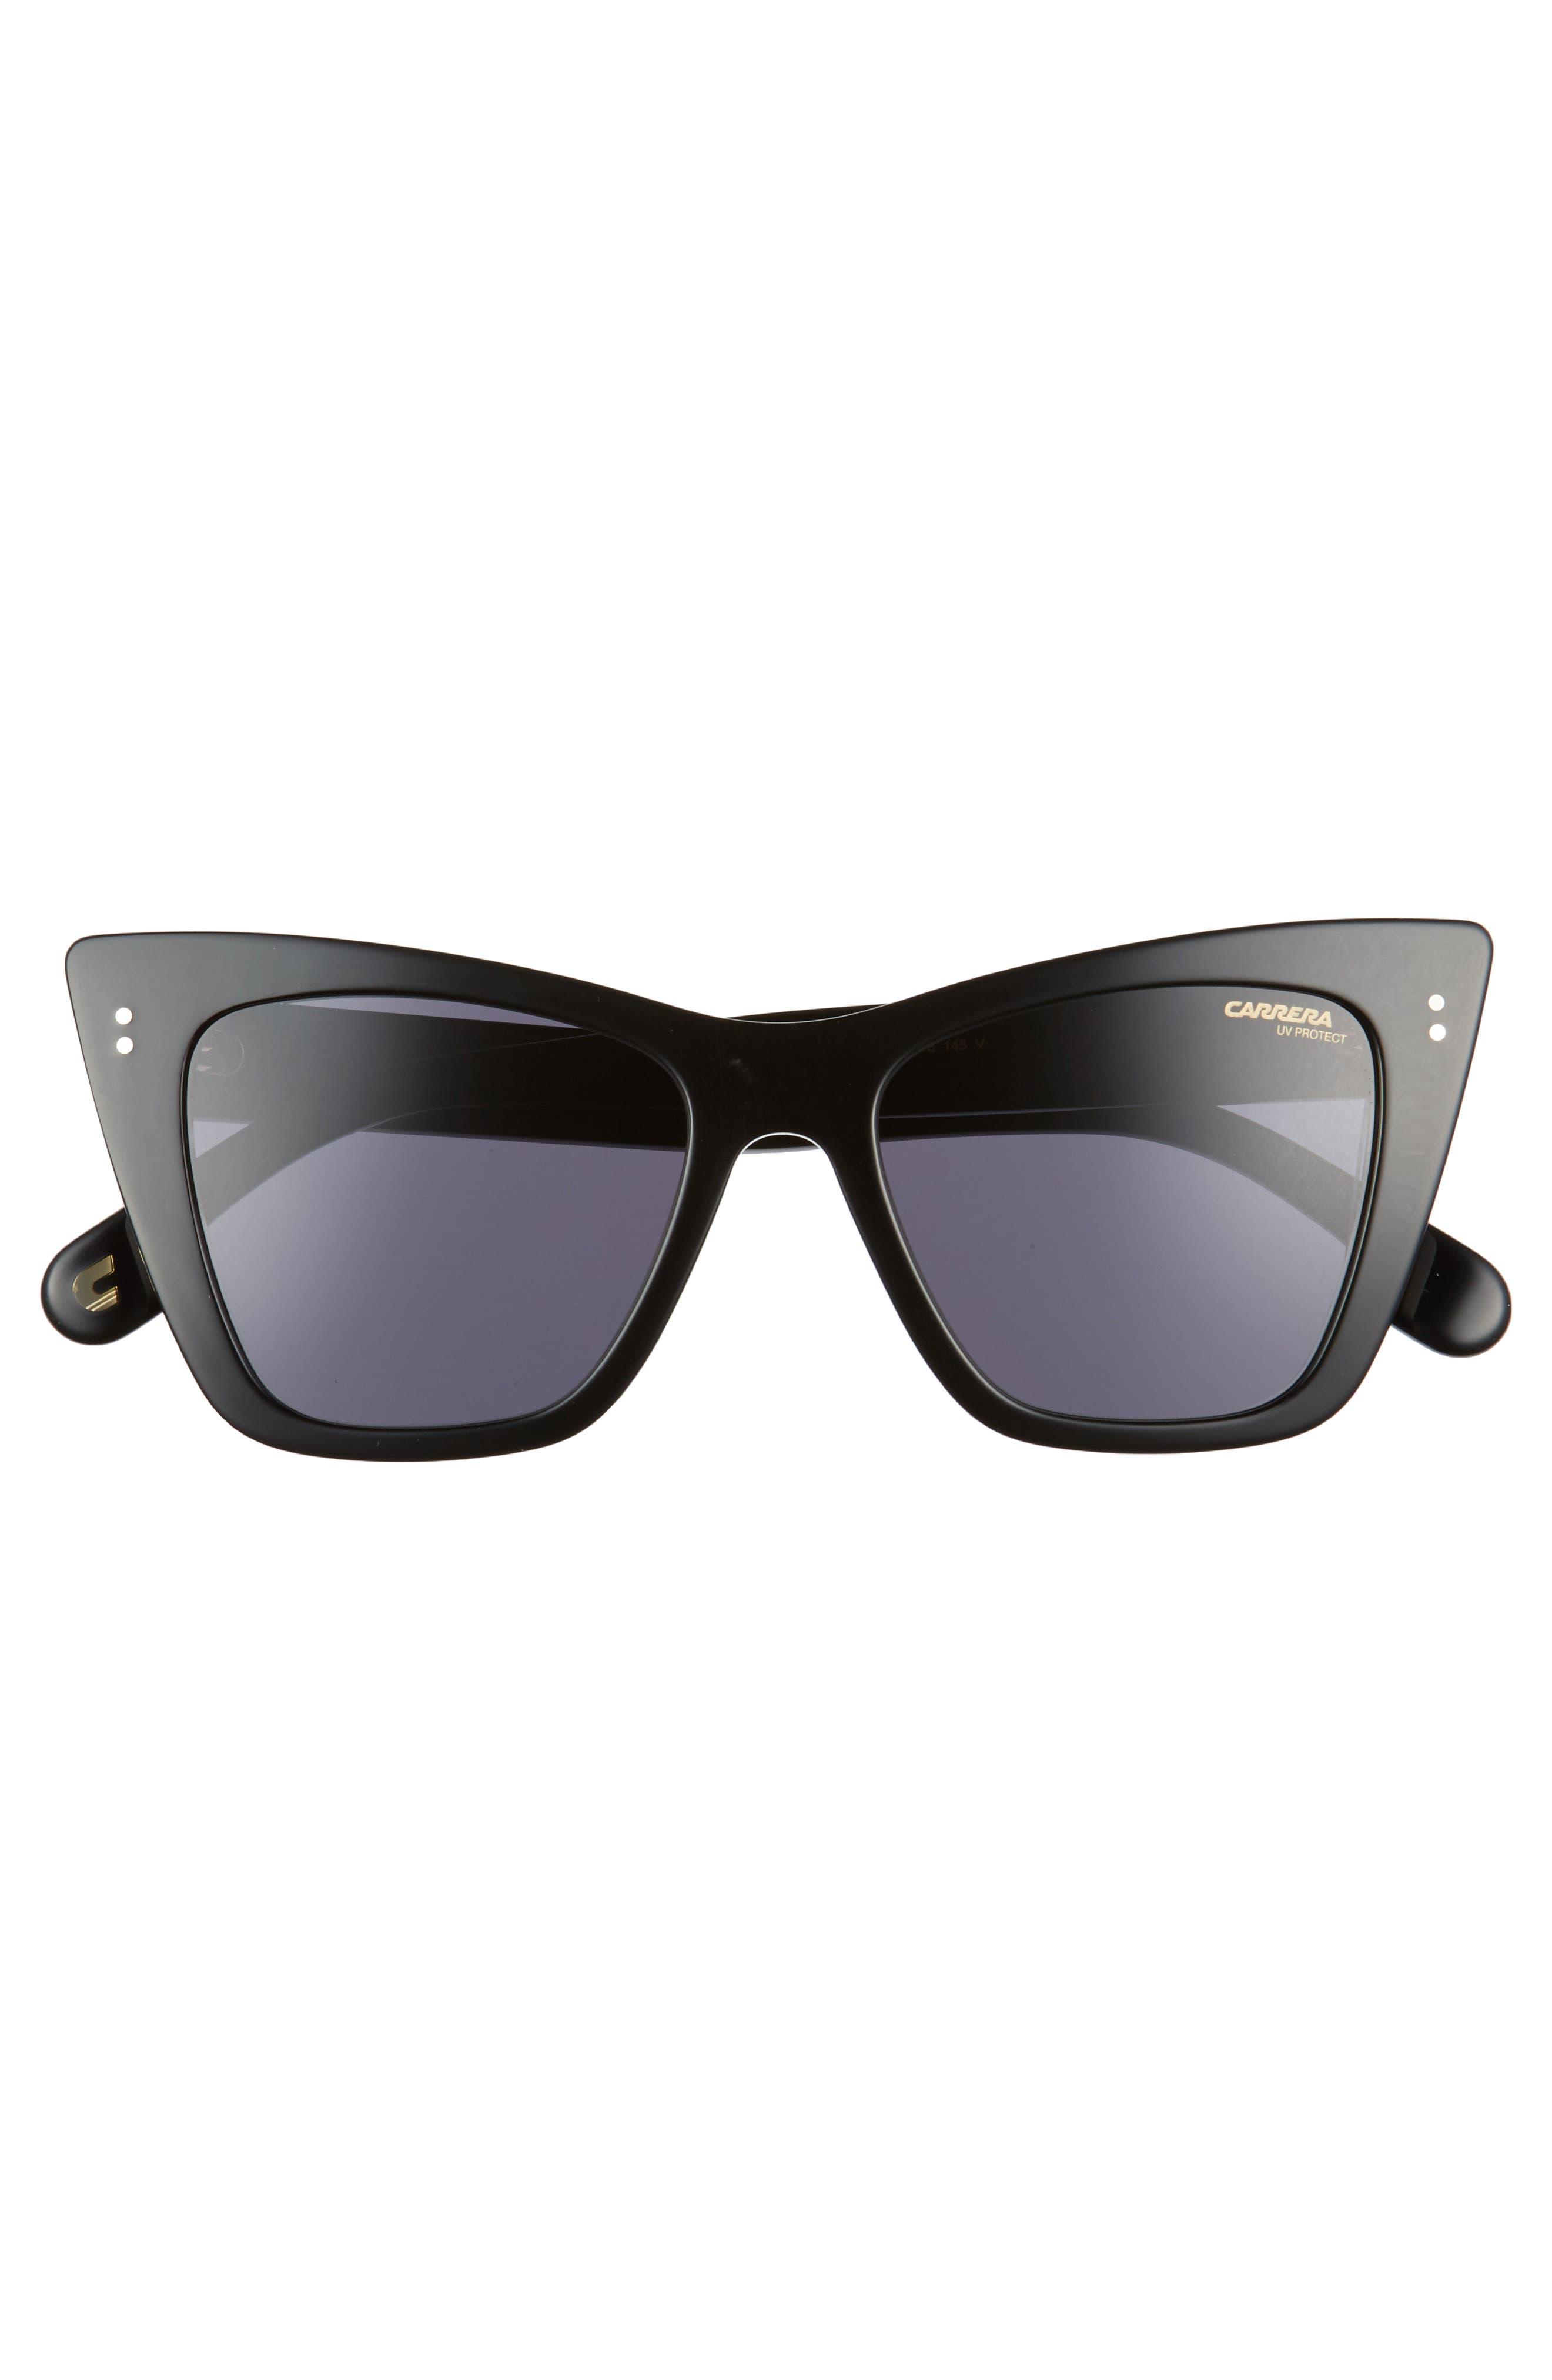 52mm Cat Eye Sunglasses,                             Alternate thumbnail 3, color,                             Black